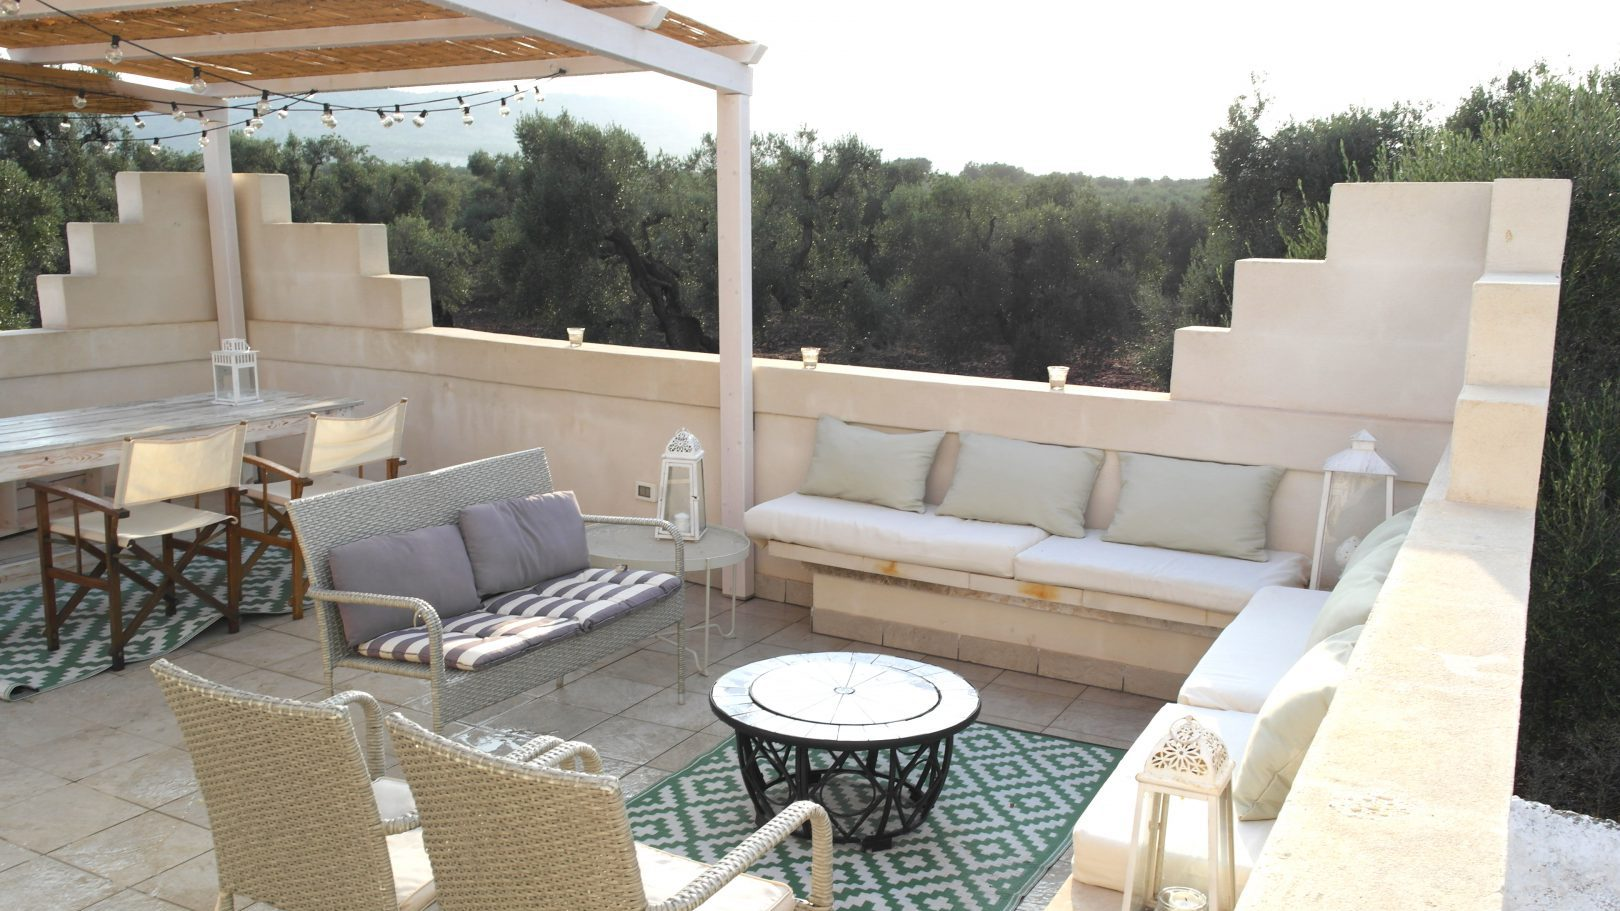 Cozy outdoor private terrace next to the swimming pool at Masseria Bellavista historic holiday vacation rental villa in ostuni puglia with seaview